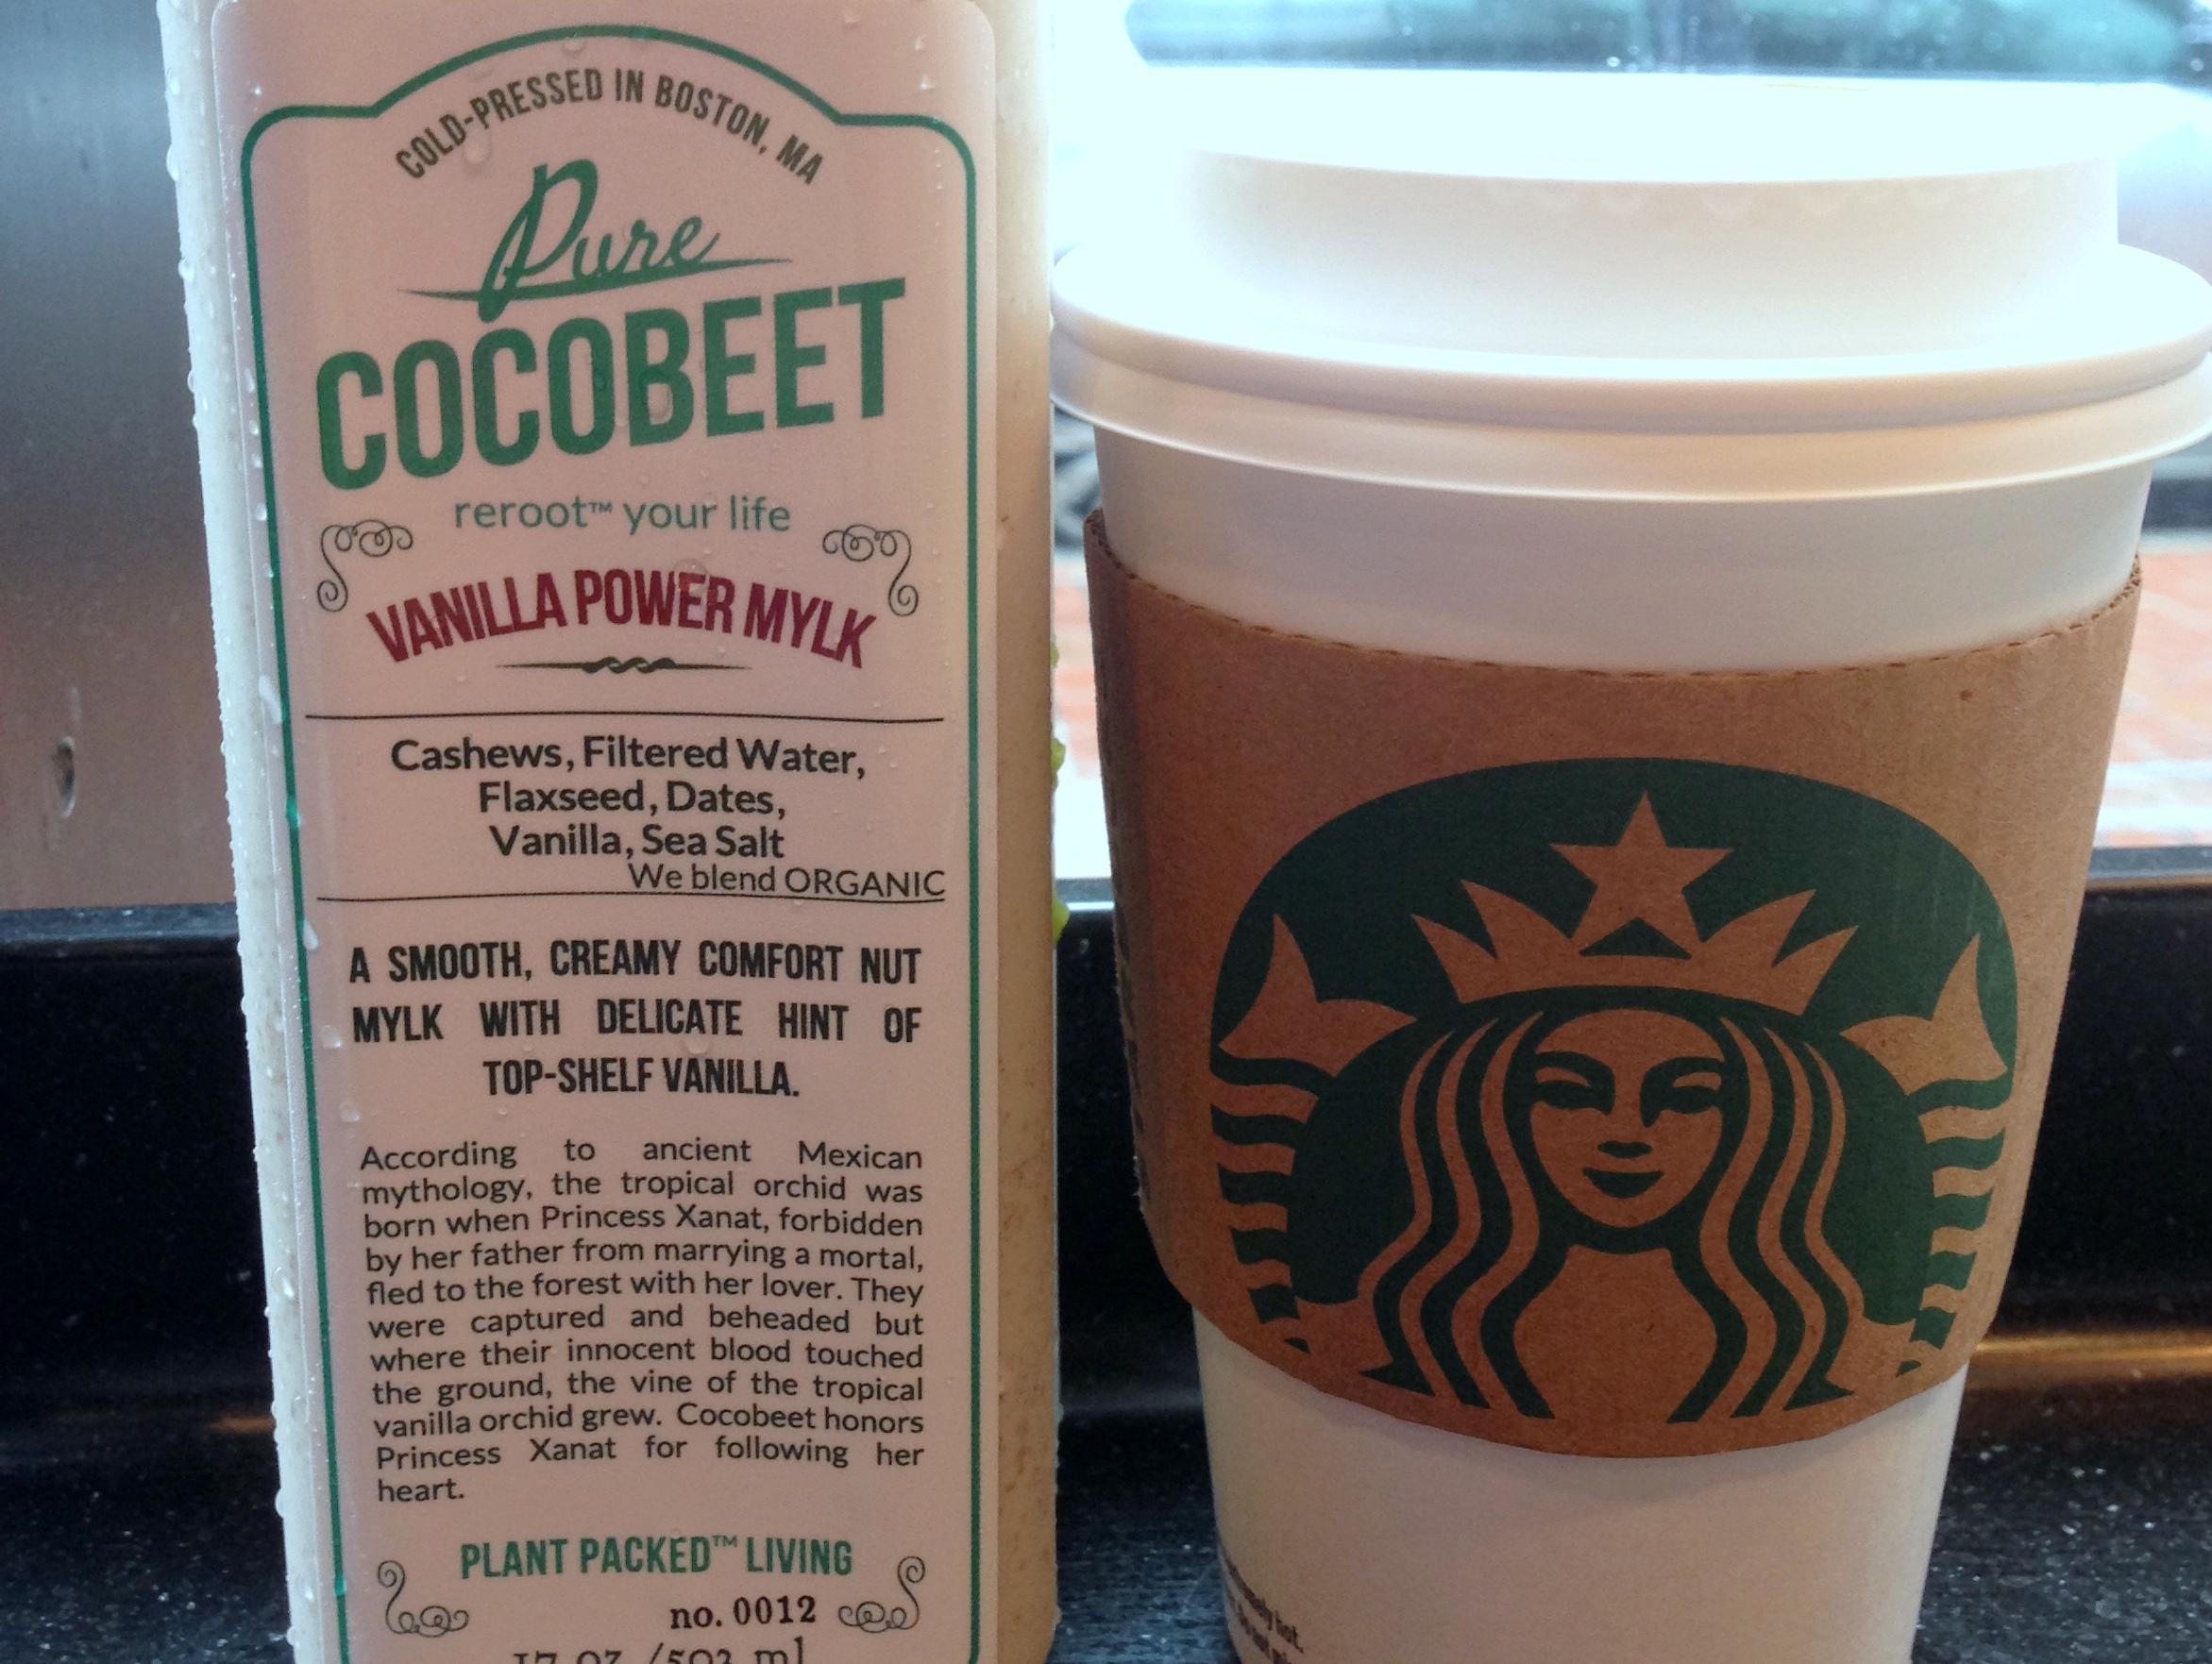 vanilla power mylk cocobeet juice cleanse